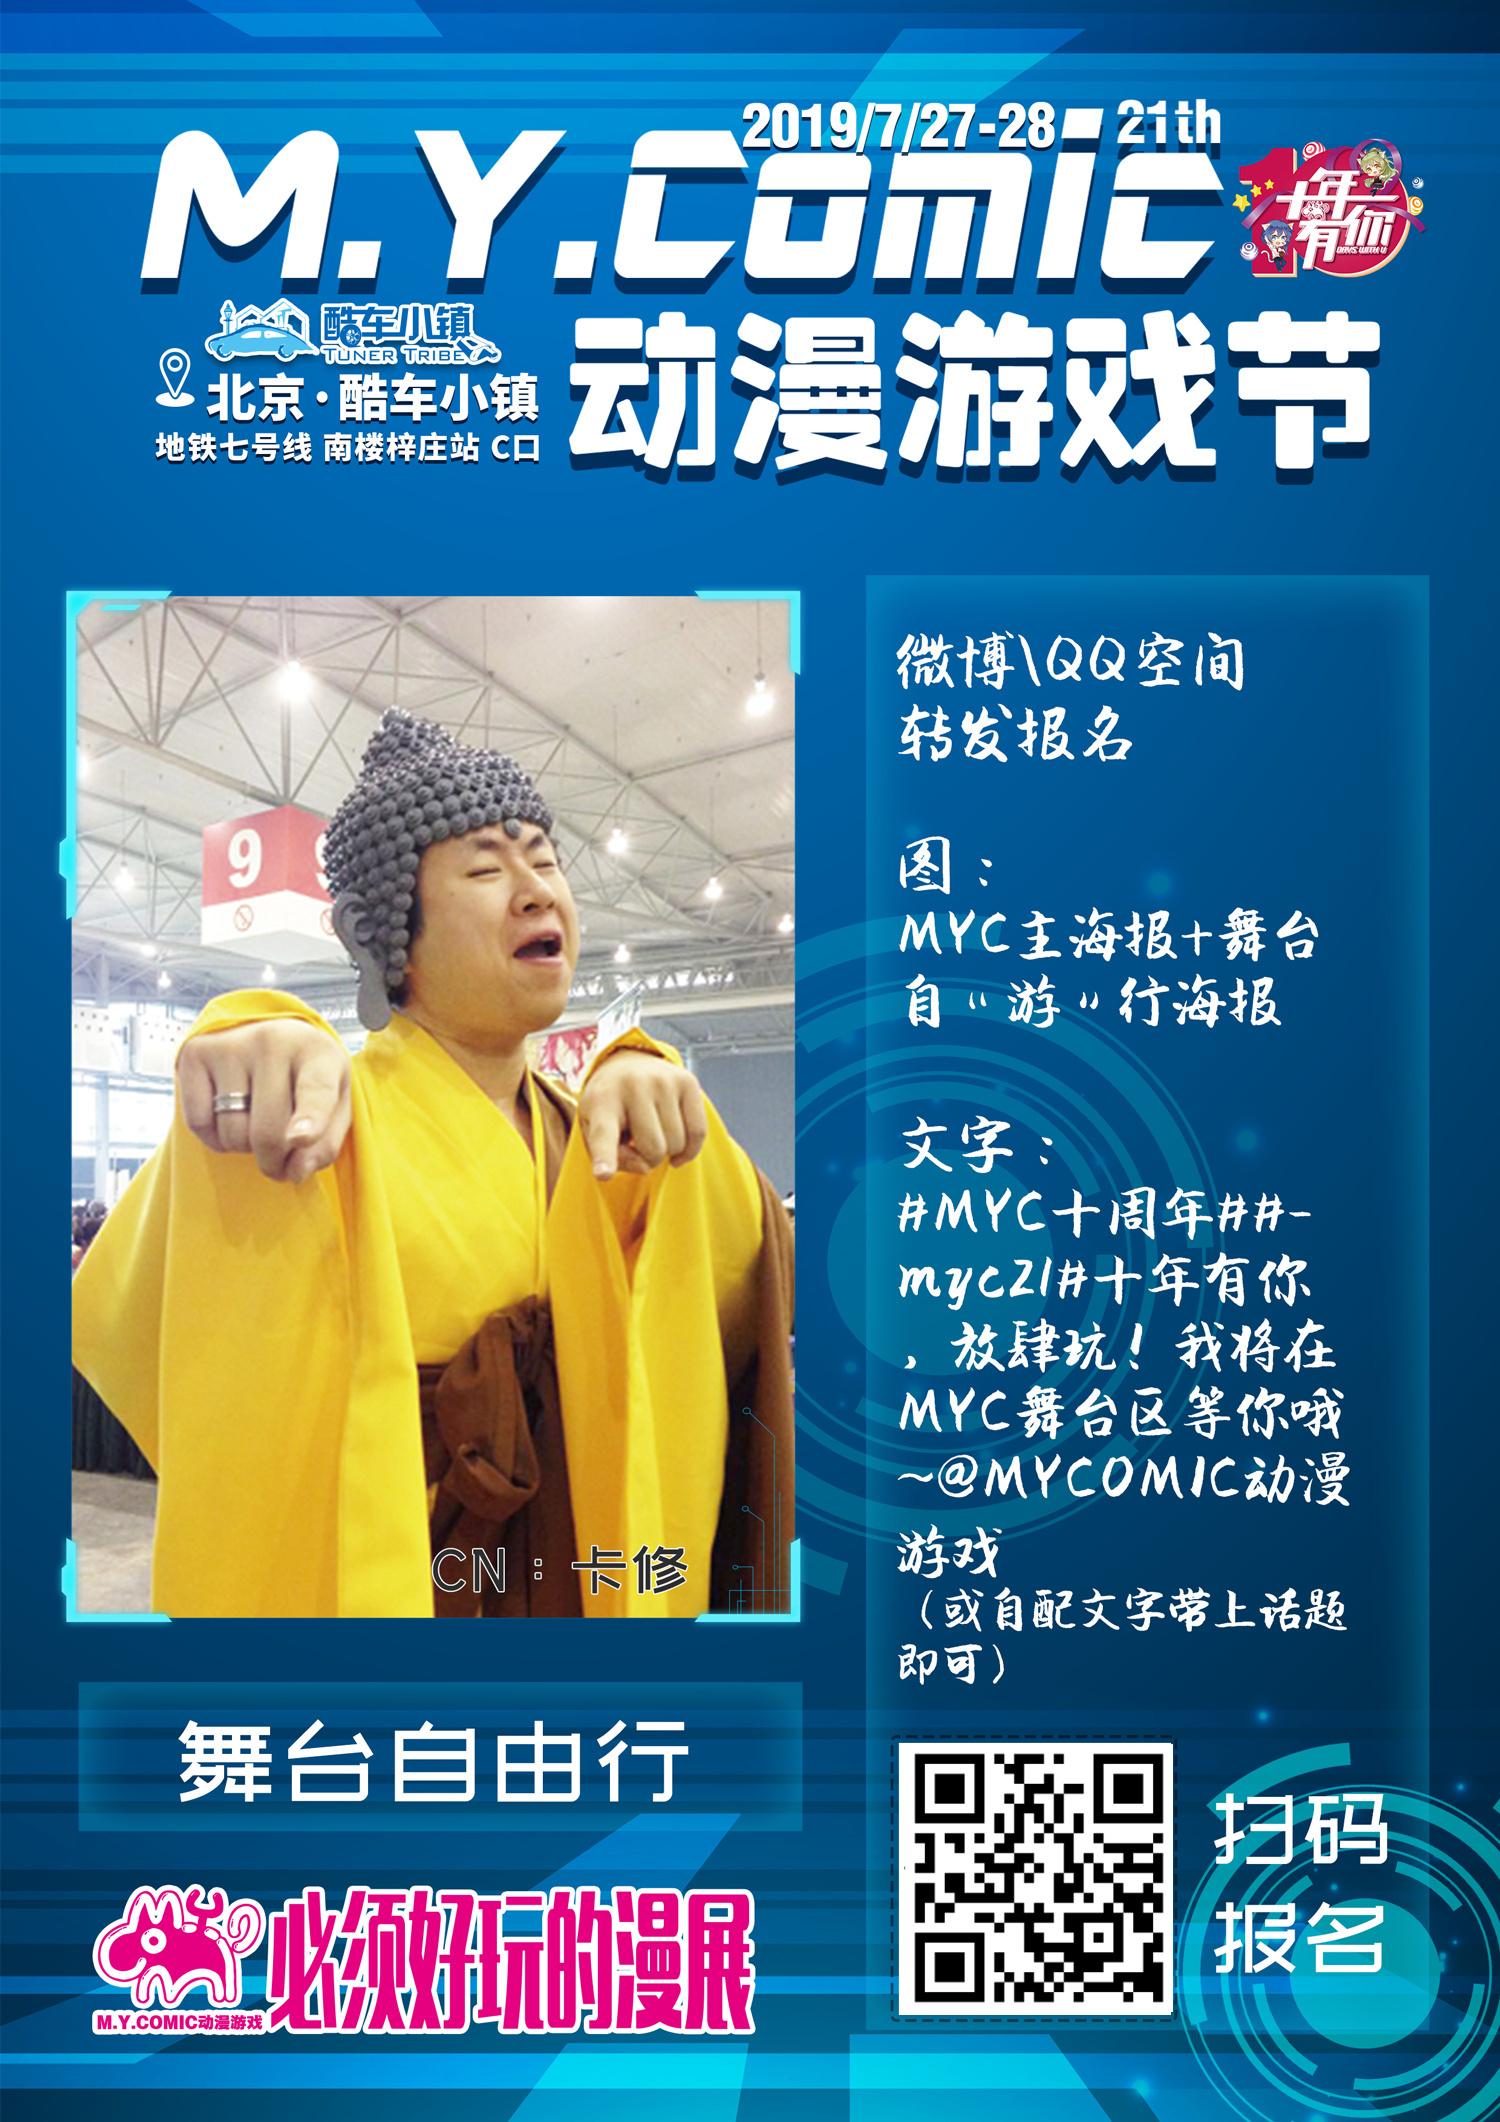 【MYC21】重磅嘉宾全线公开,这个暑假我们酷车小镇见!-ANICOGA